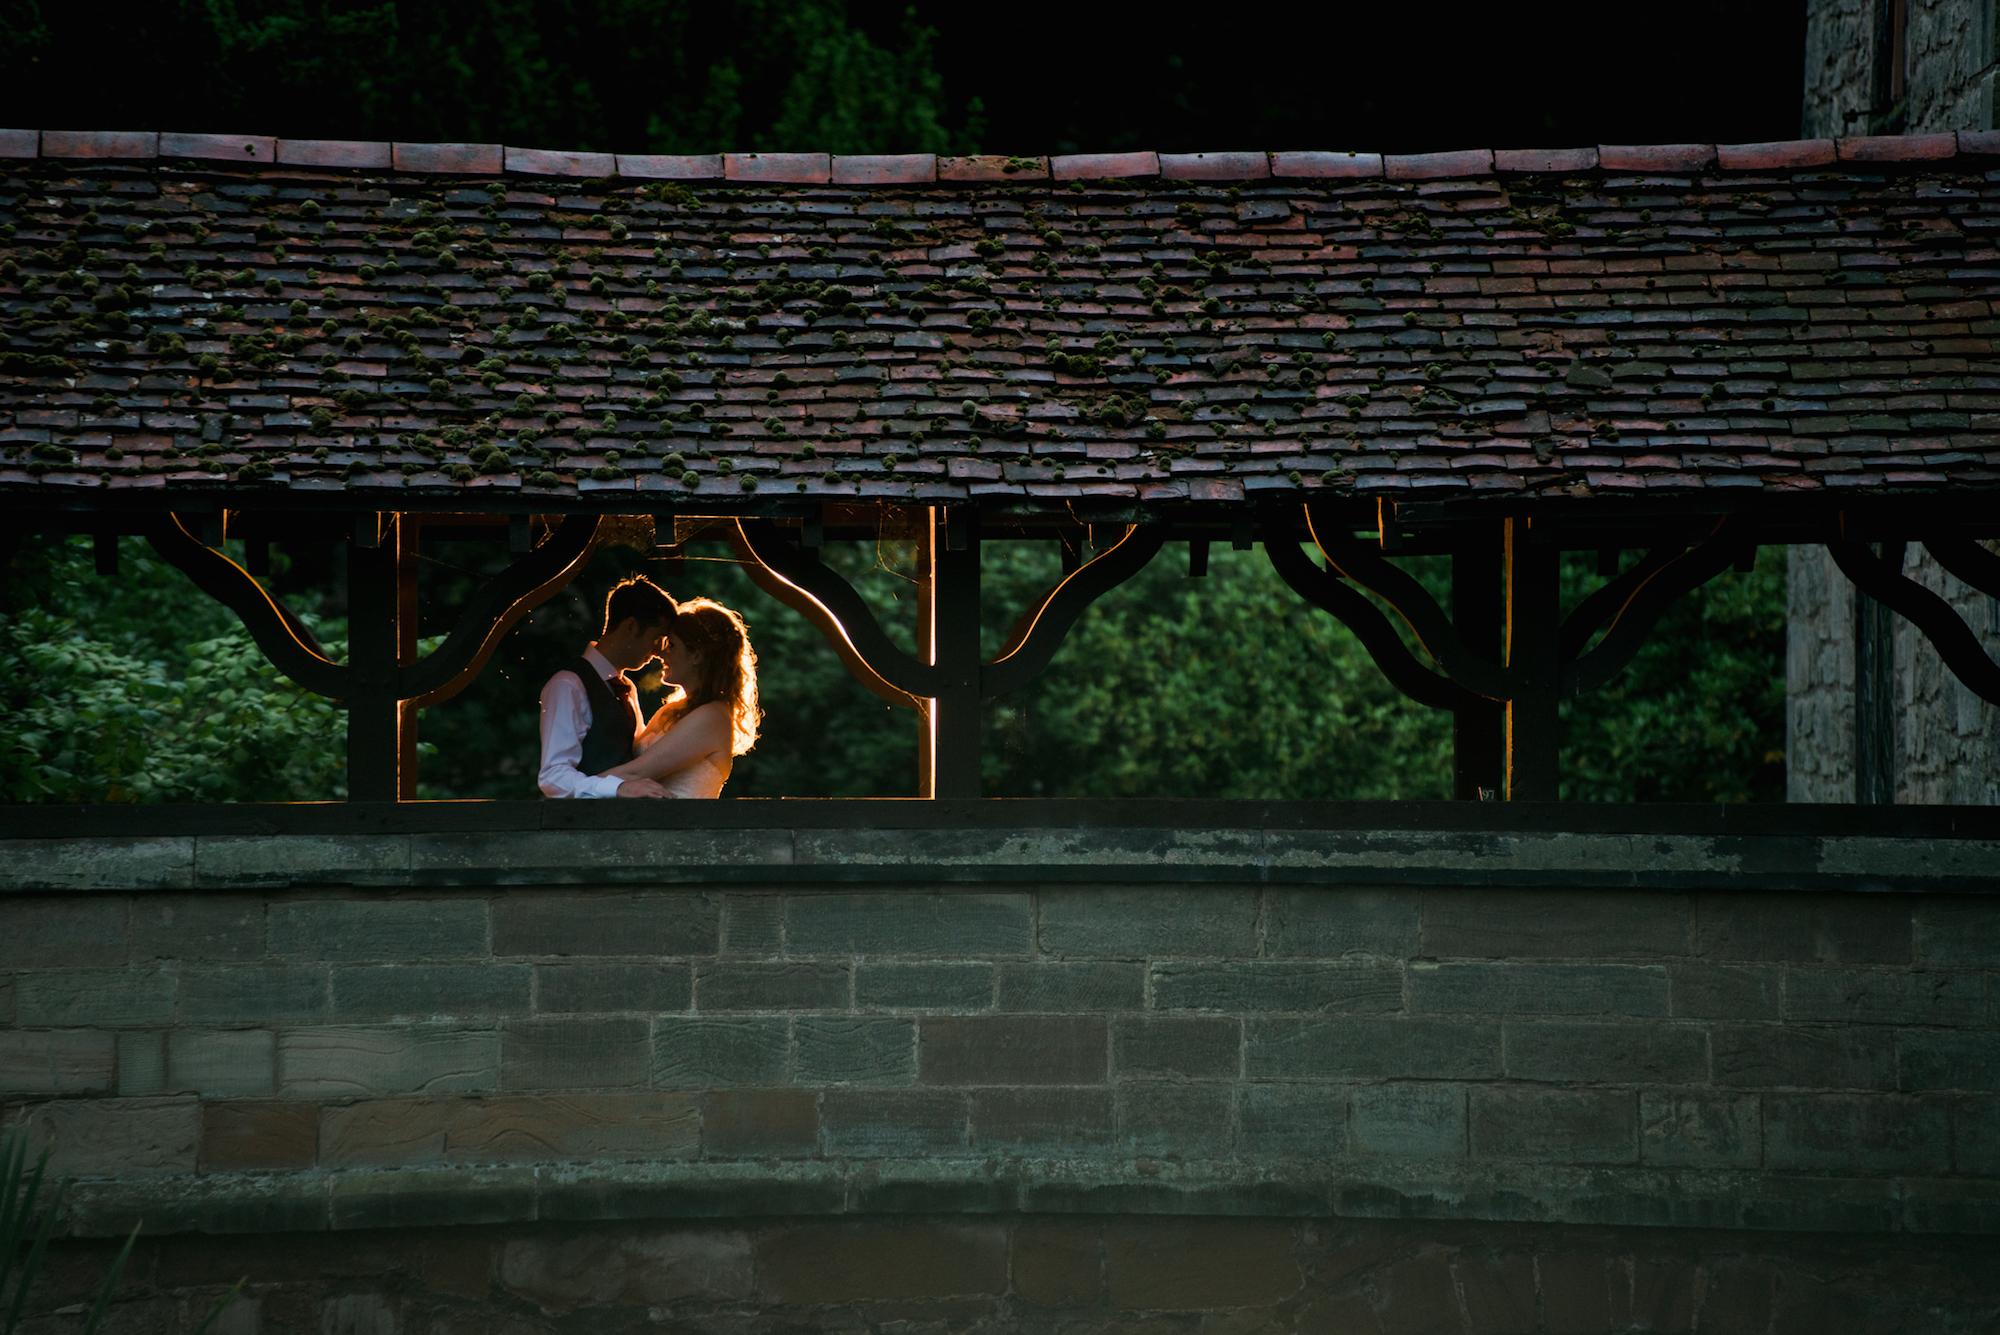 002 Bride Groom London Wedding Photographer Photography.jpg